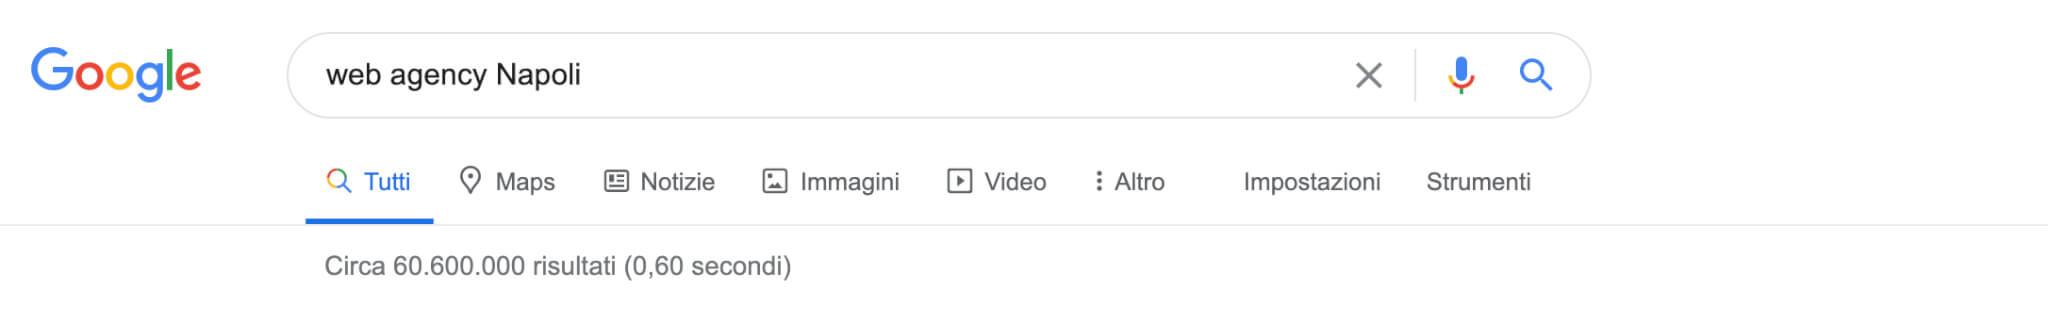 web agency napoli google